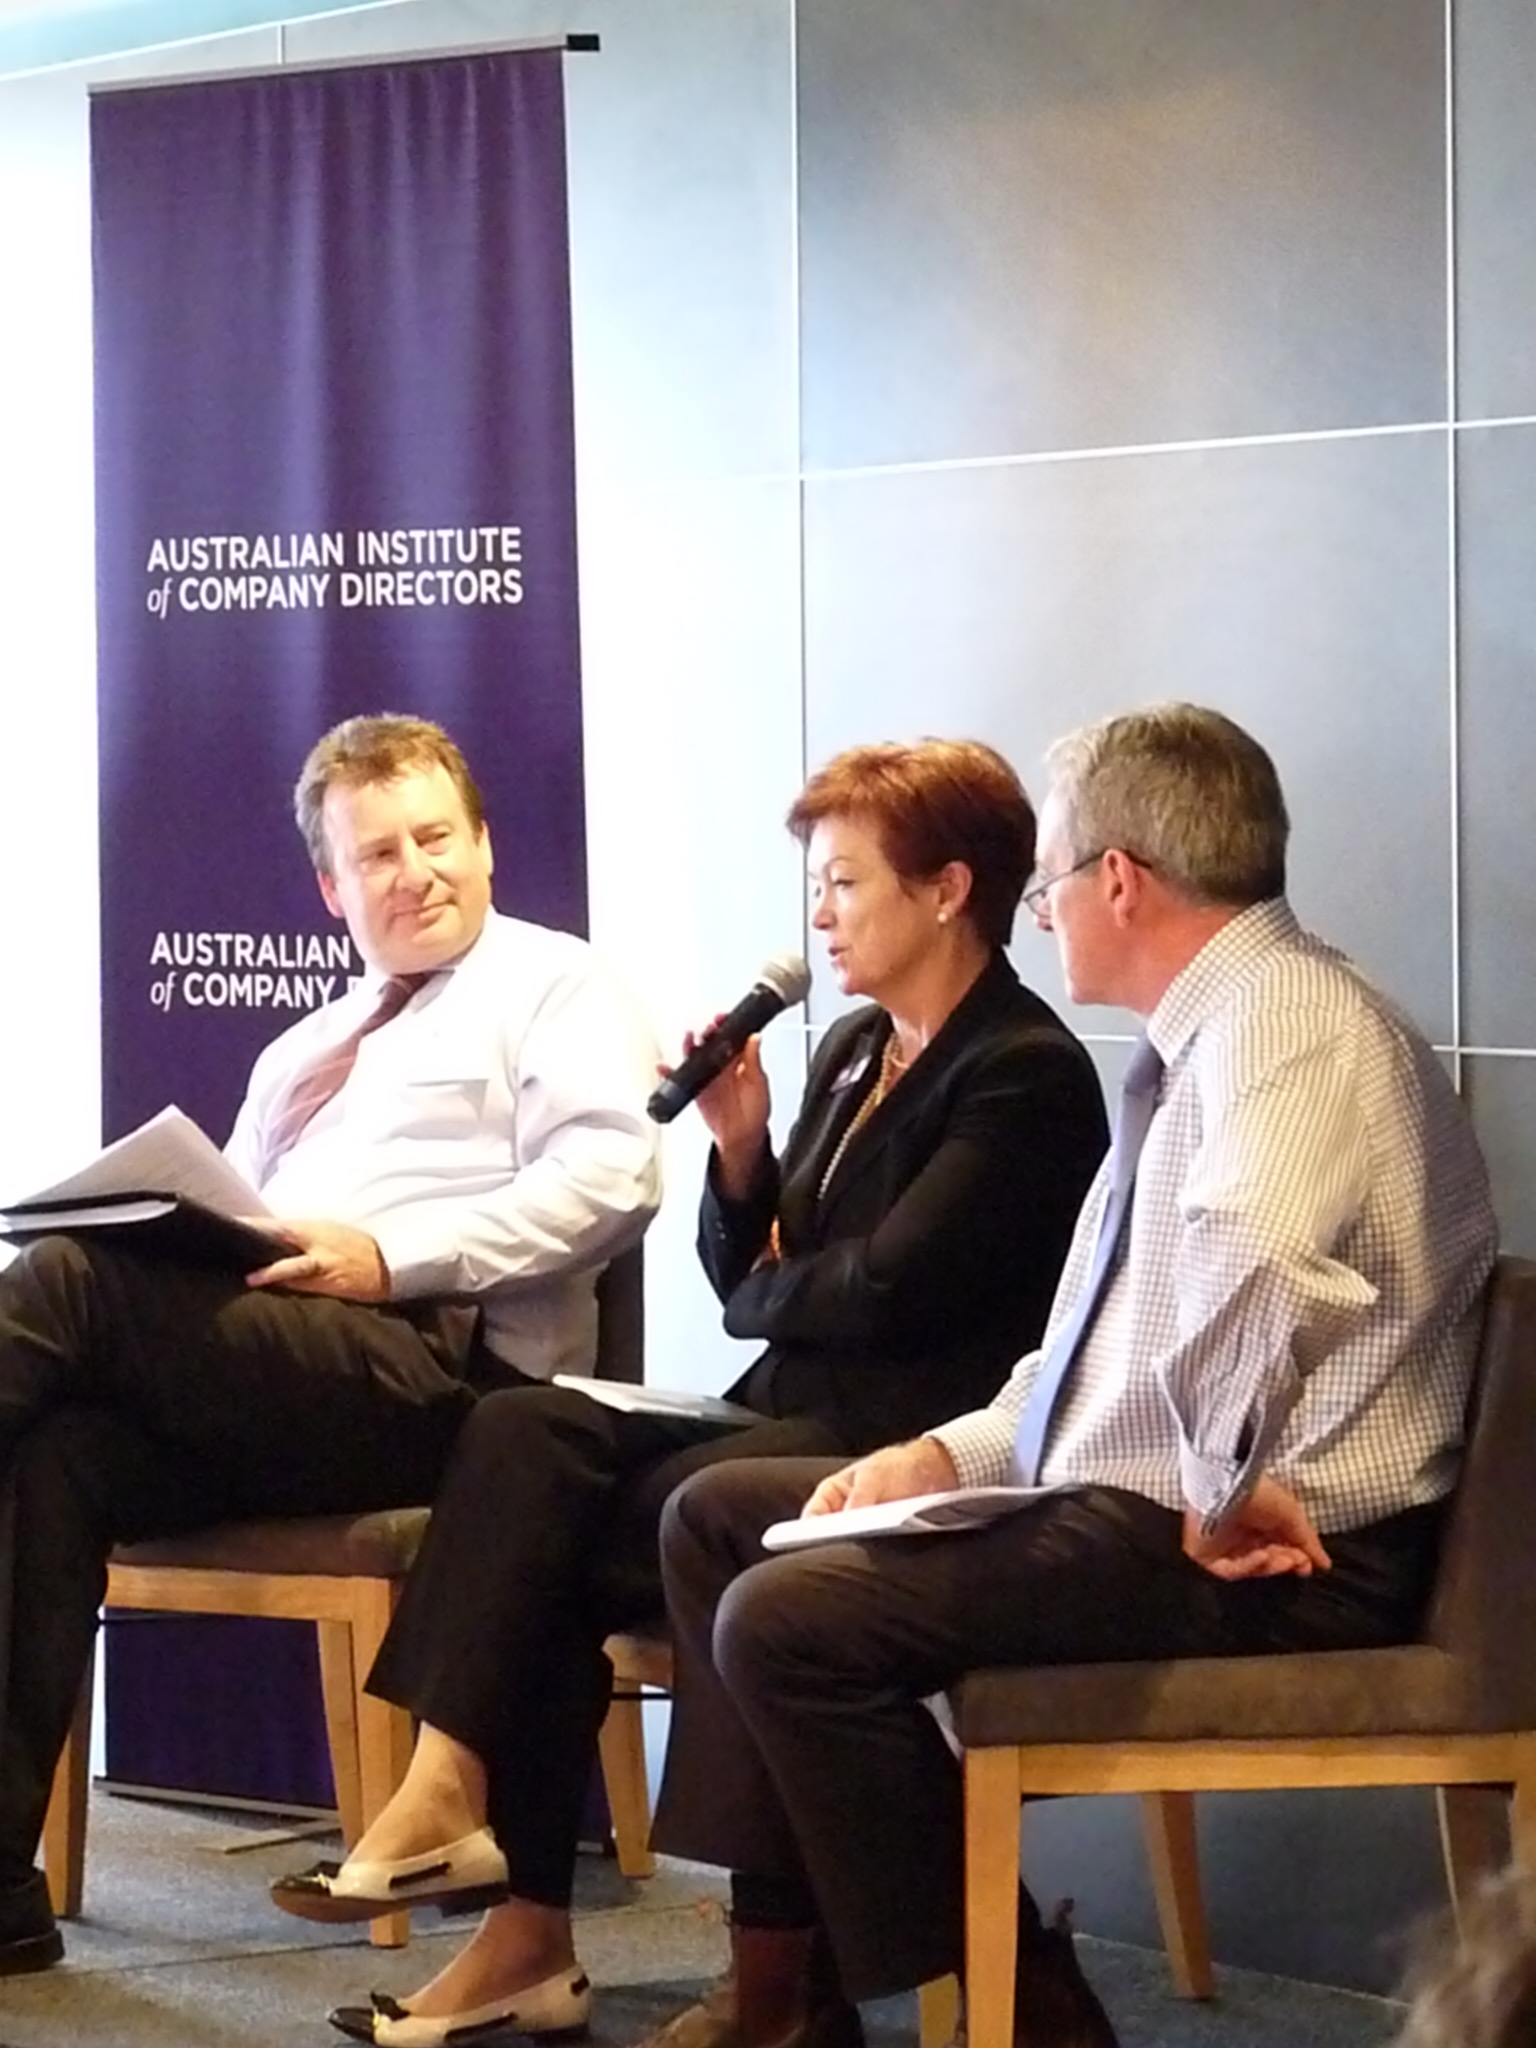 Company Directors panel